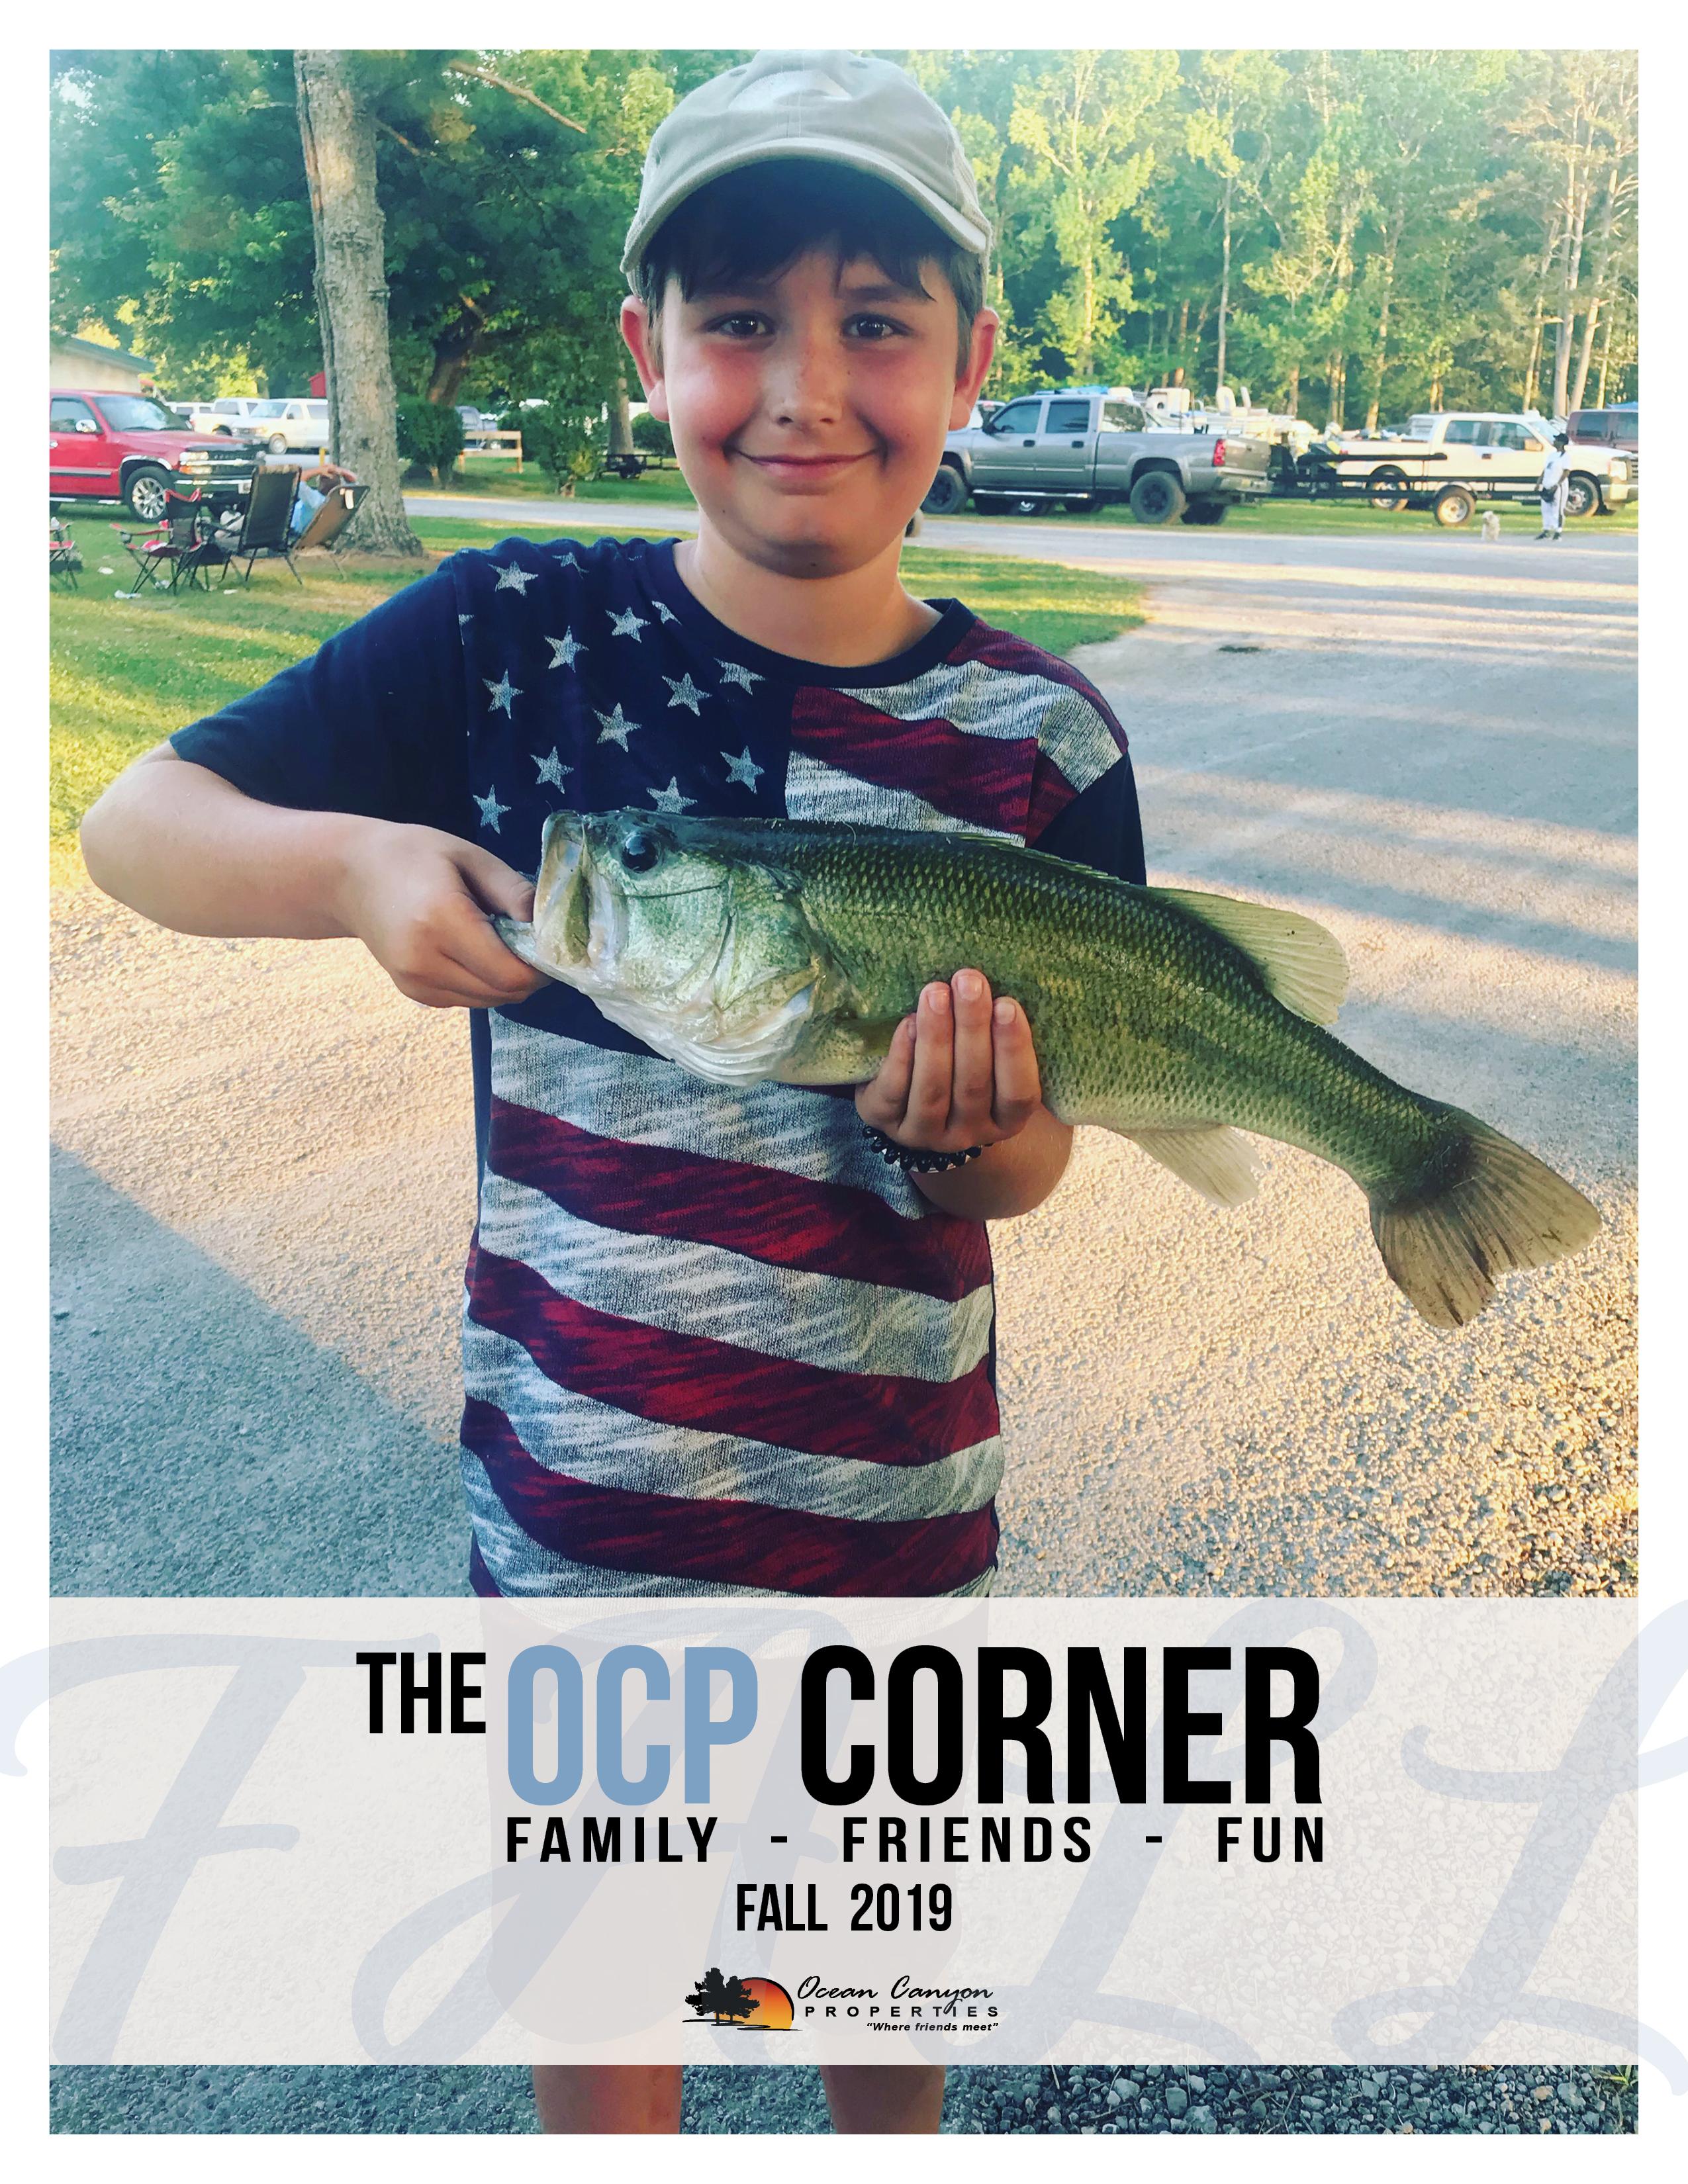 OCP Corner - Spring 2019